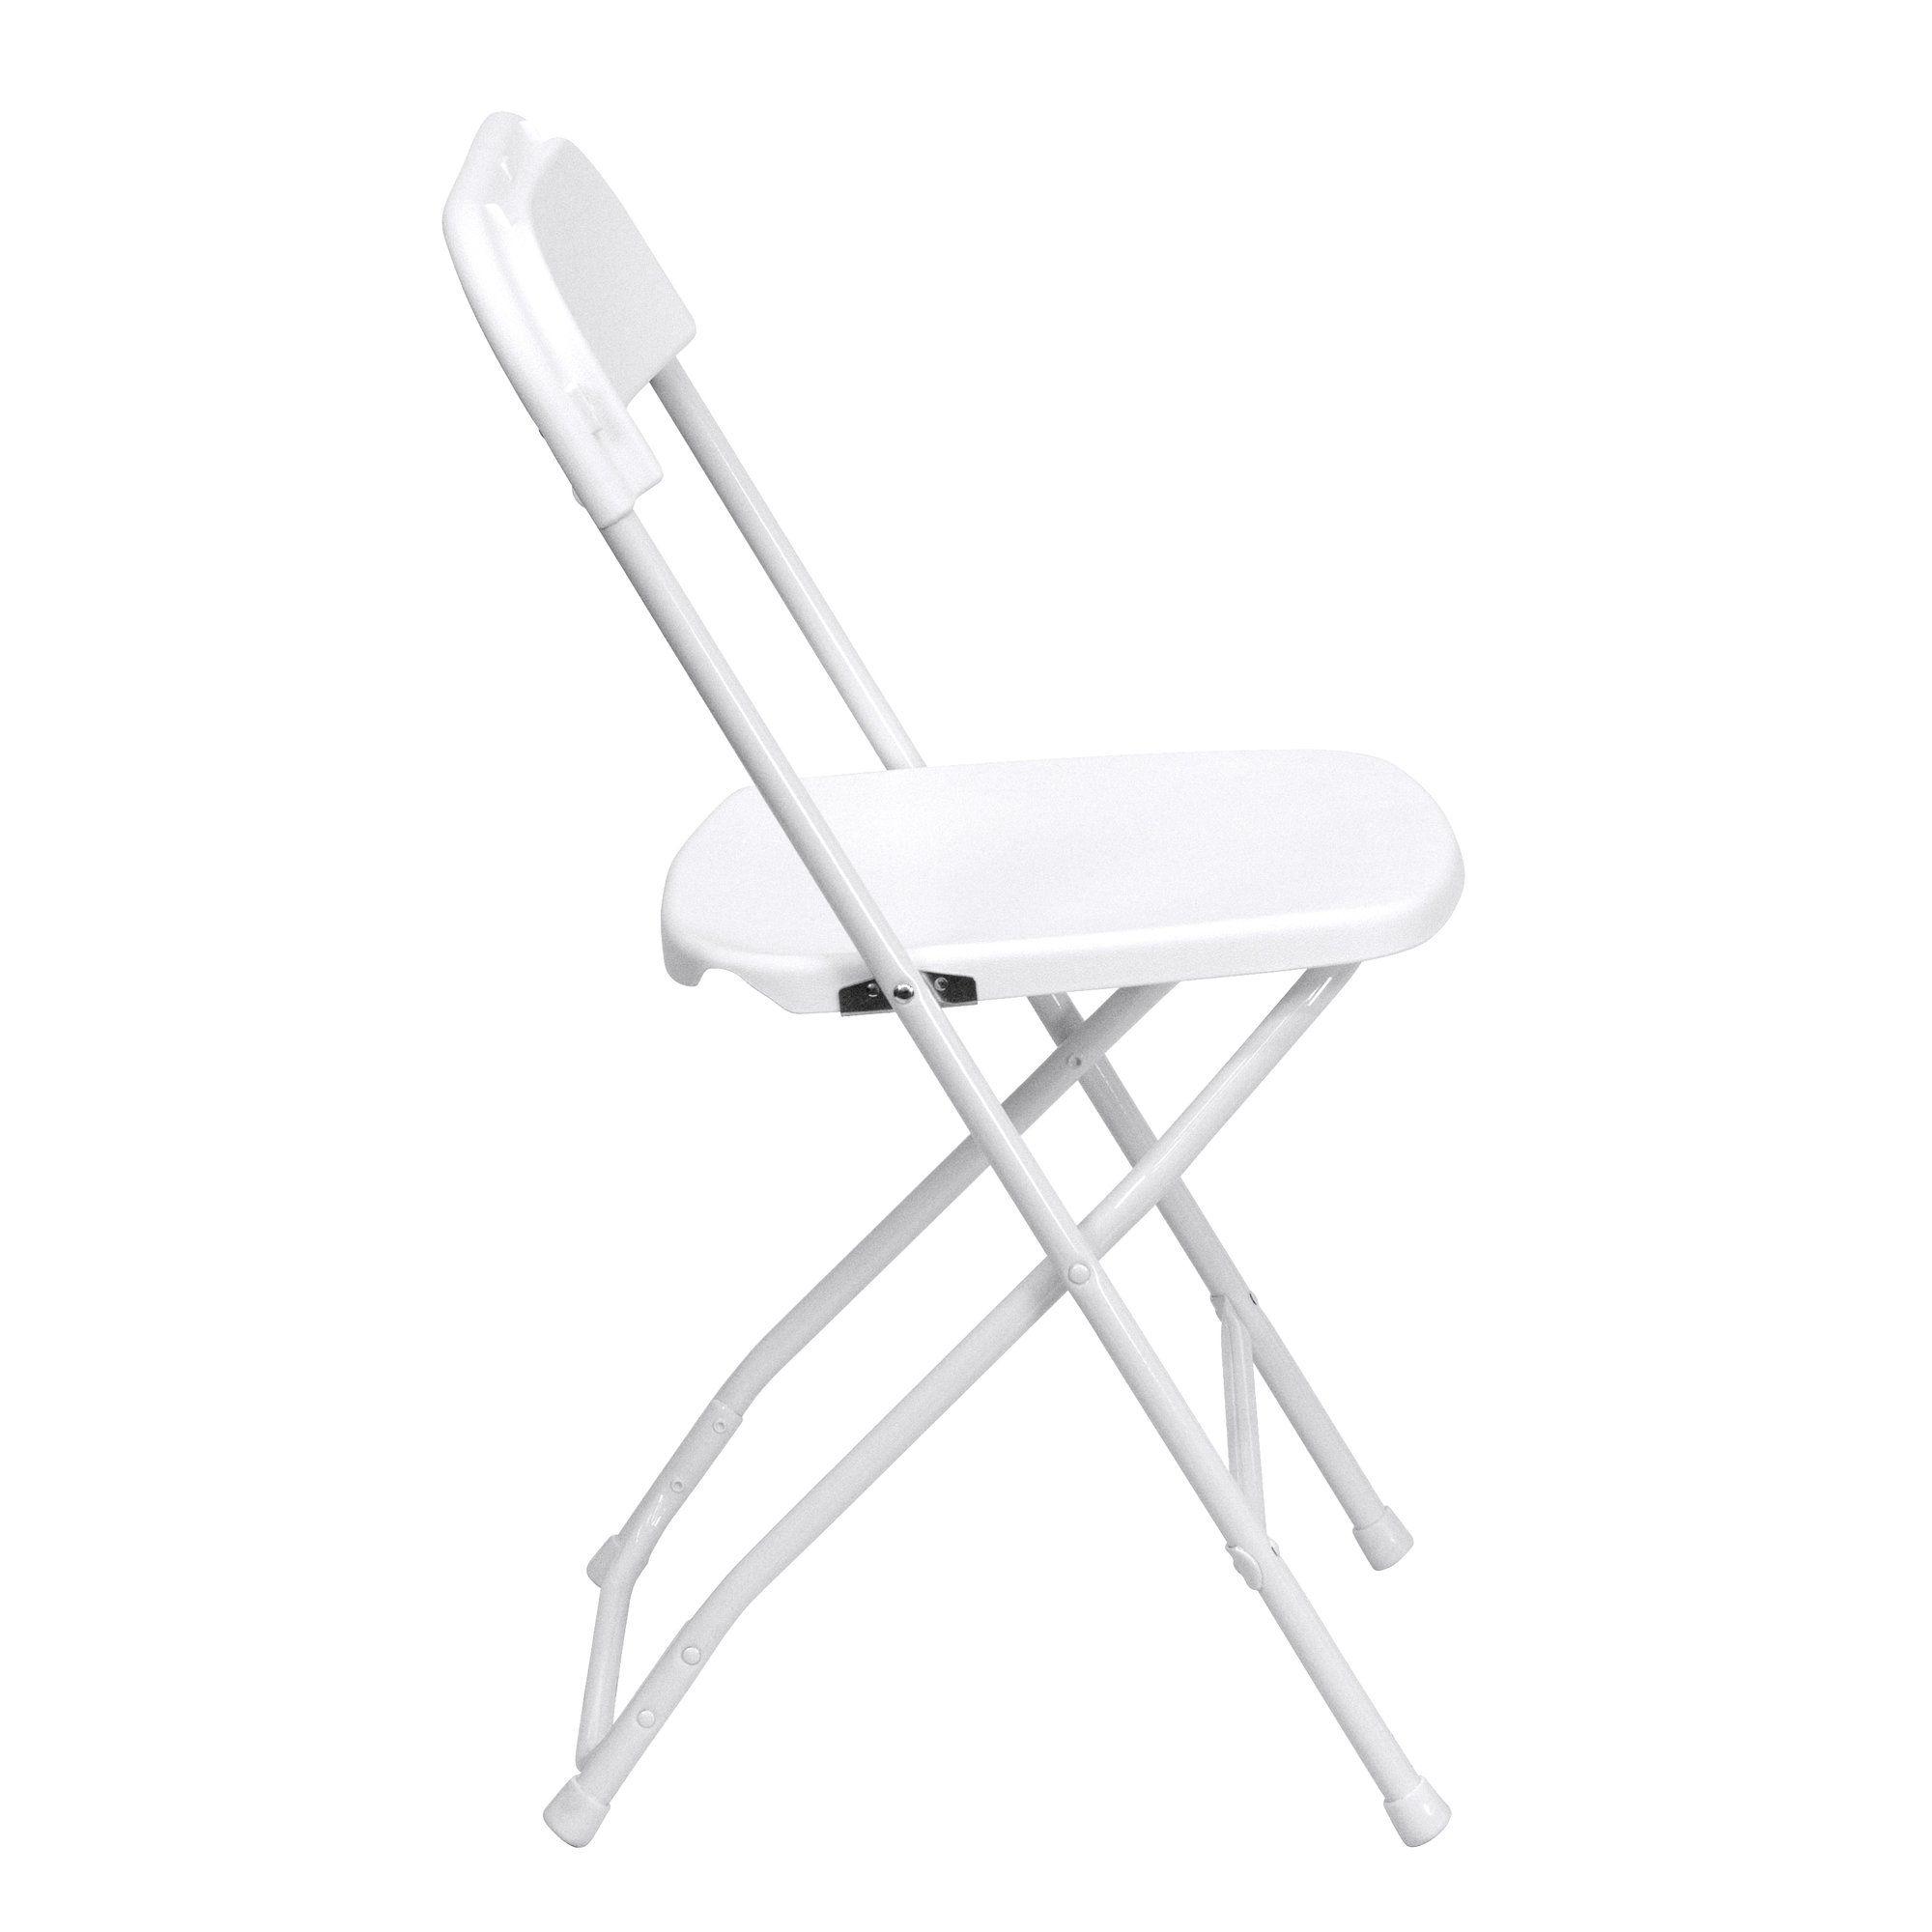 Kunststoff Klappstuhl Klappstuhl Stuhle Kunststoff